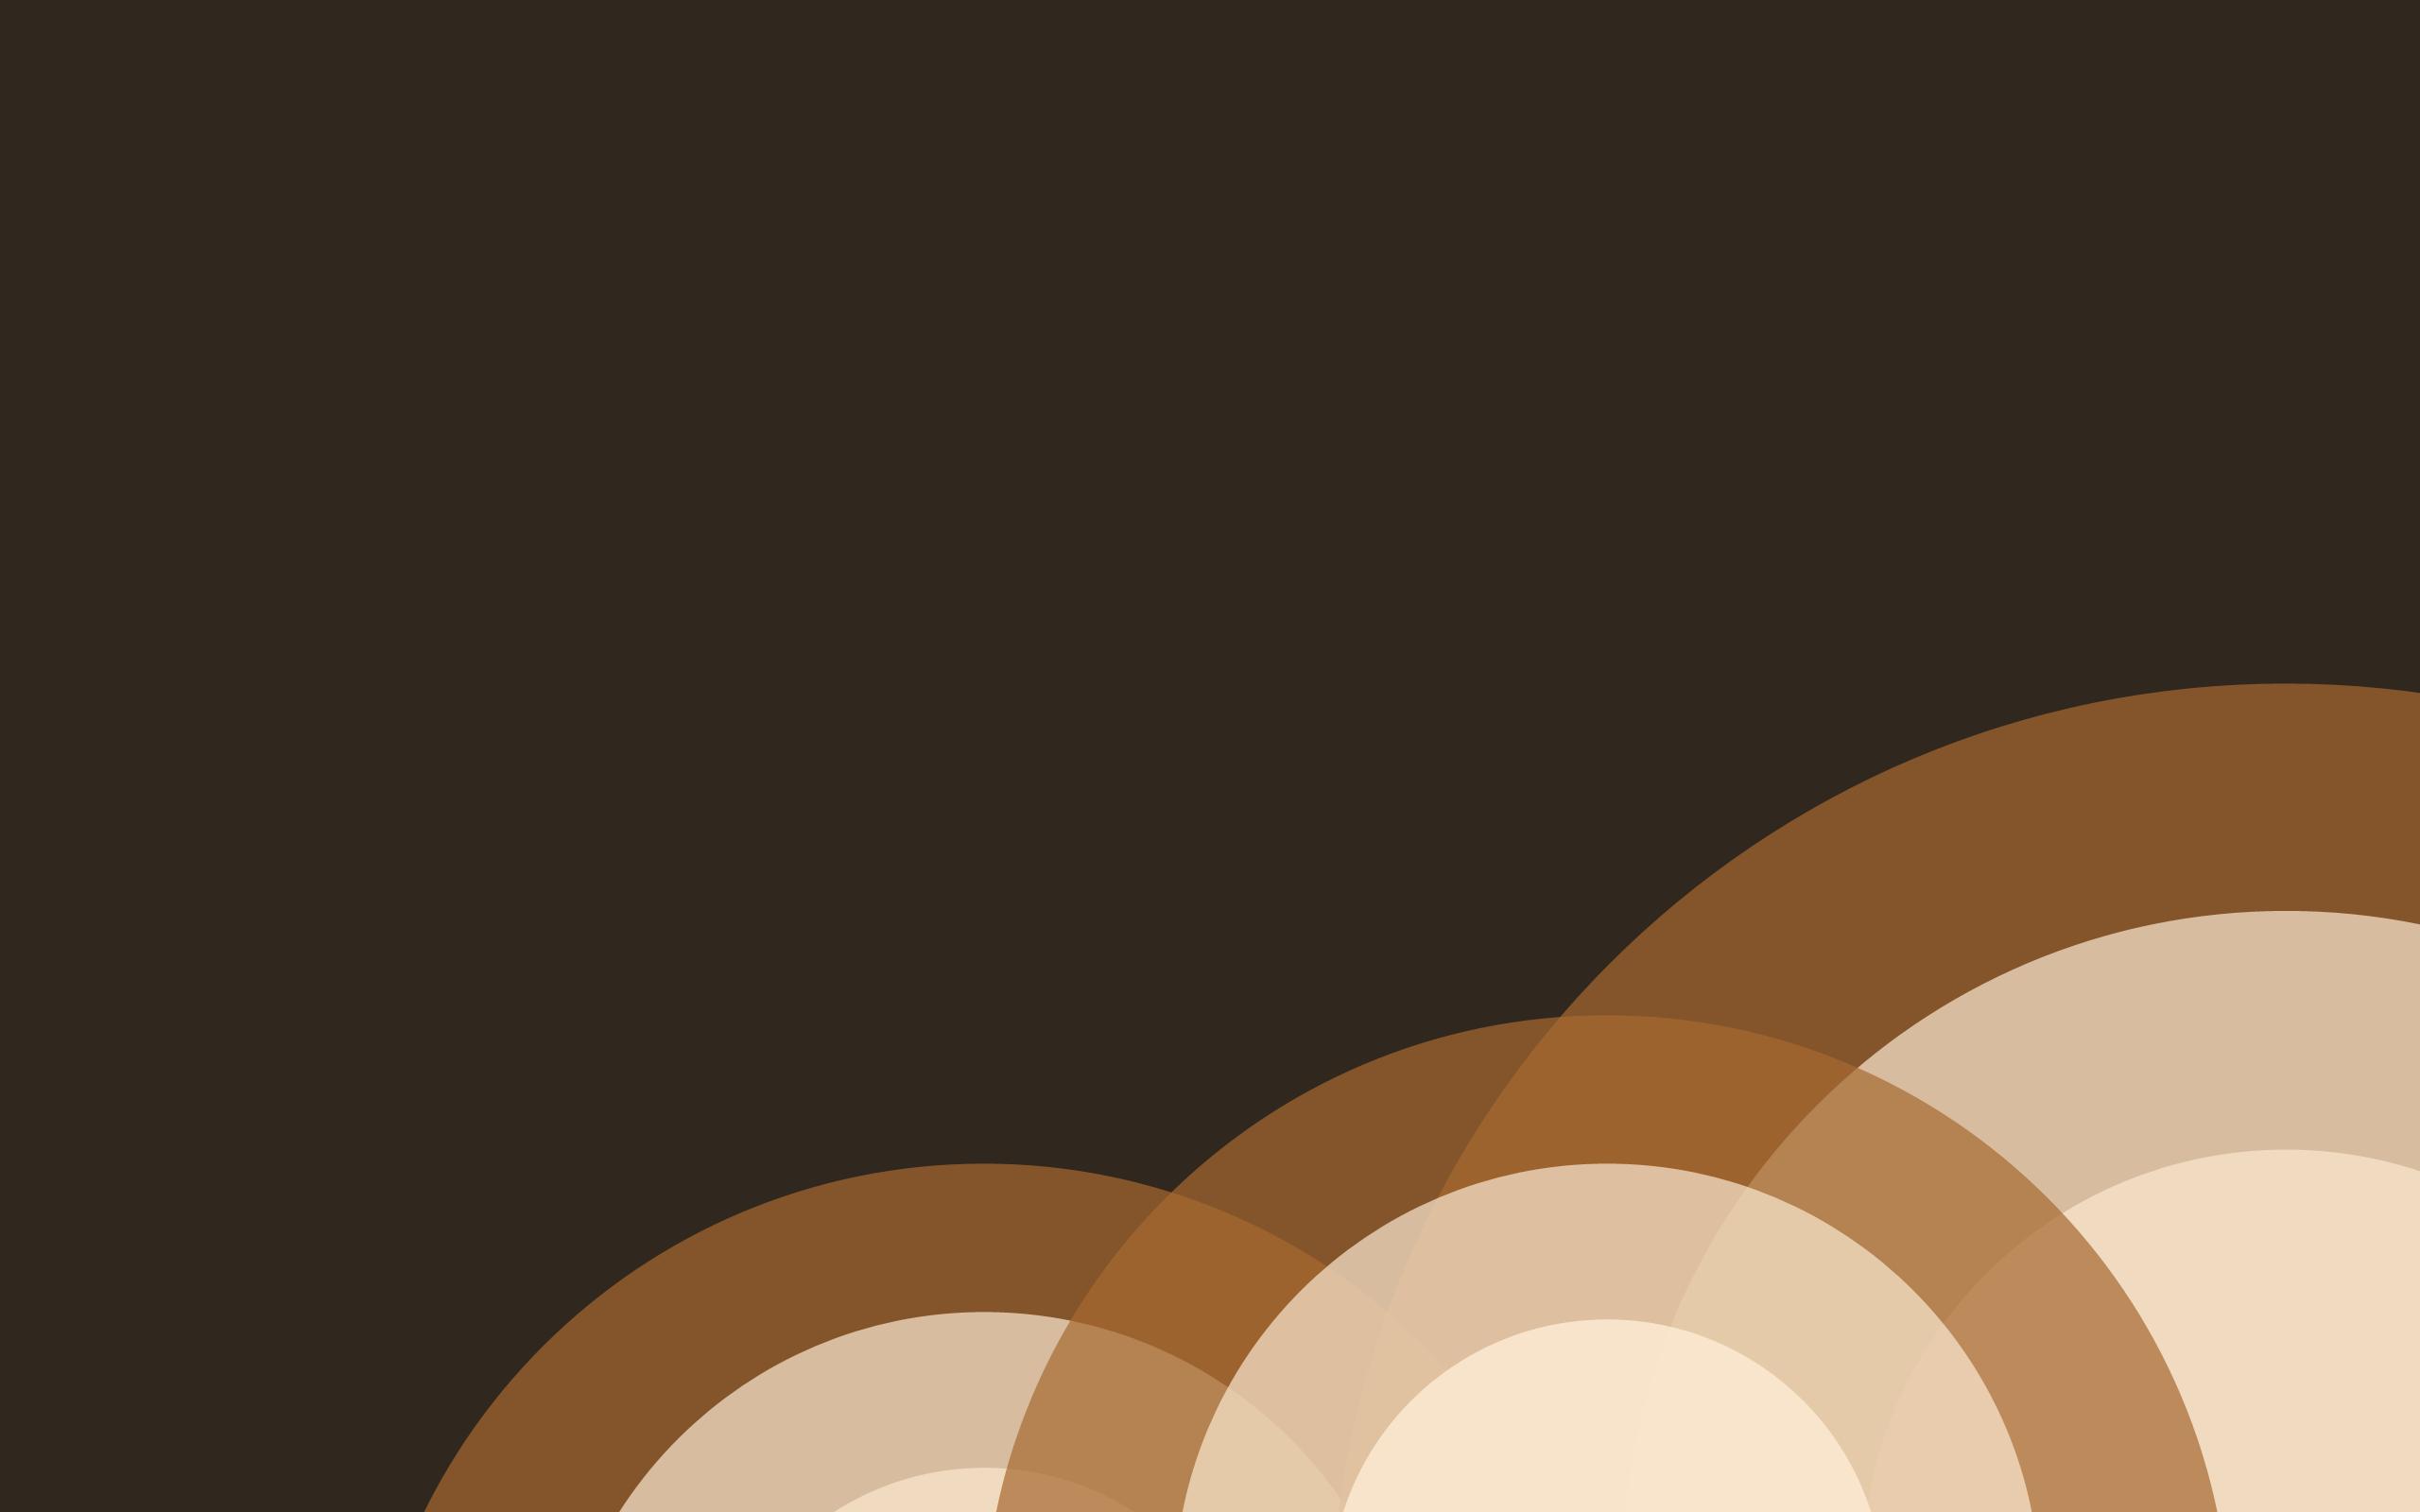 minimal brown wallpaper 45738 2560x1600px